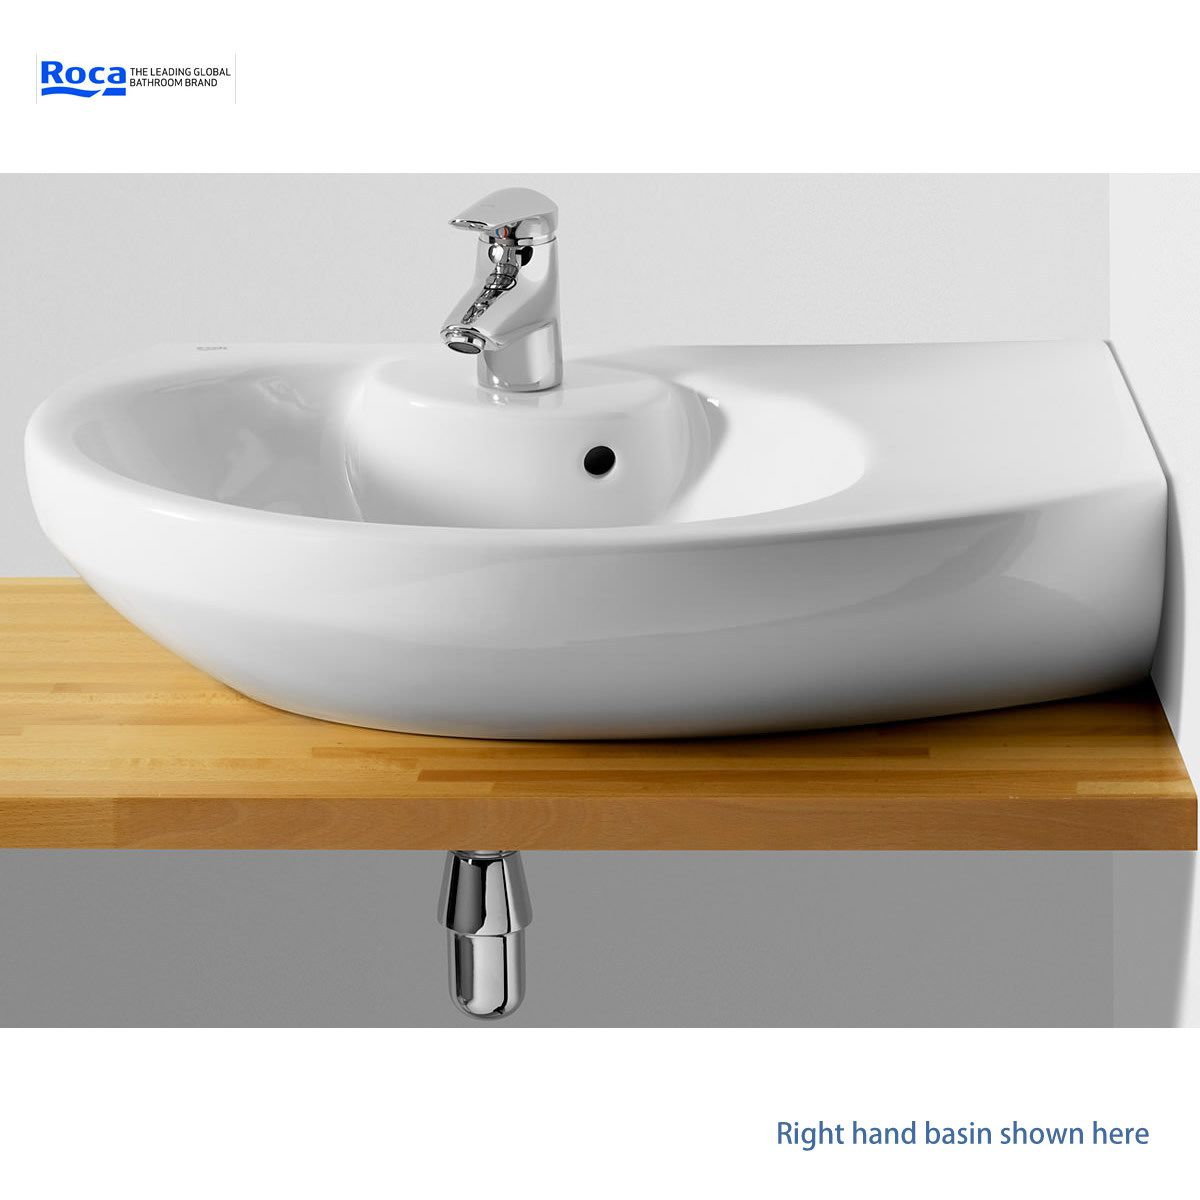 Roca Senso Compact 680mm Offset Corner Basin Uk Bathrooms